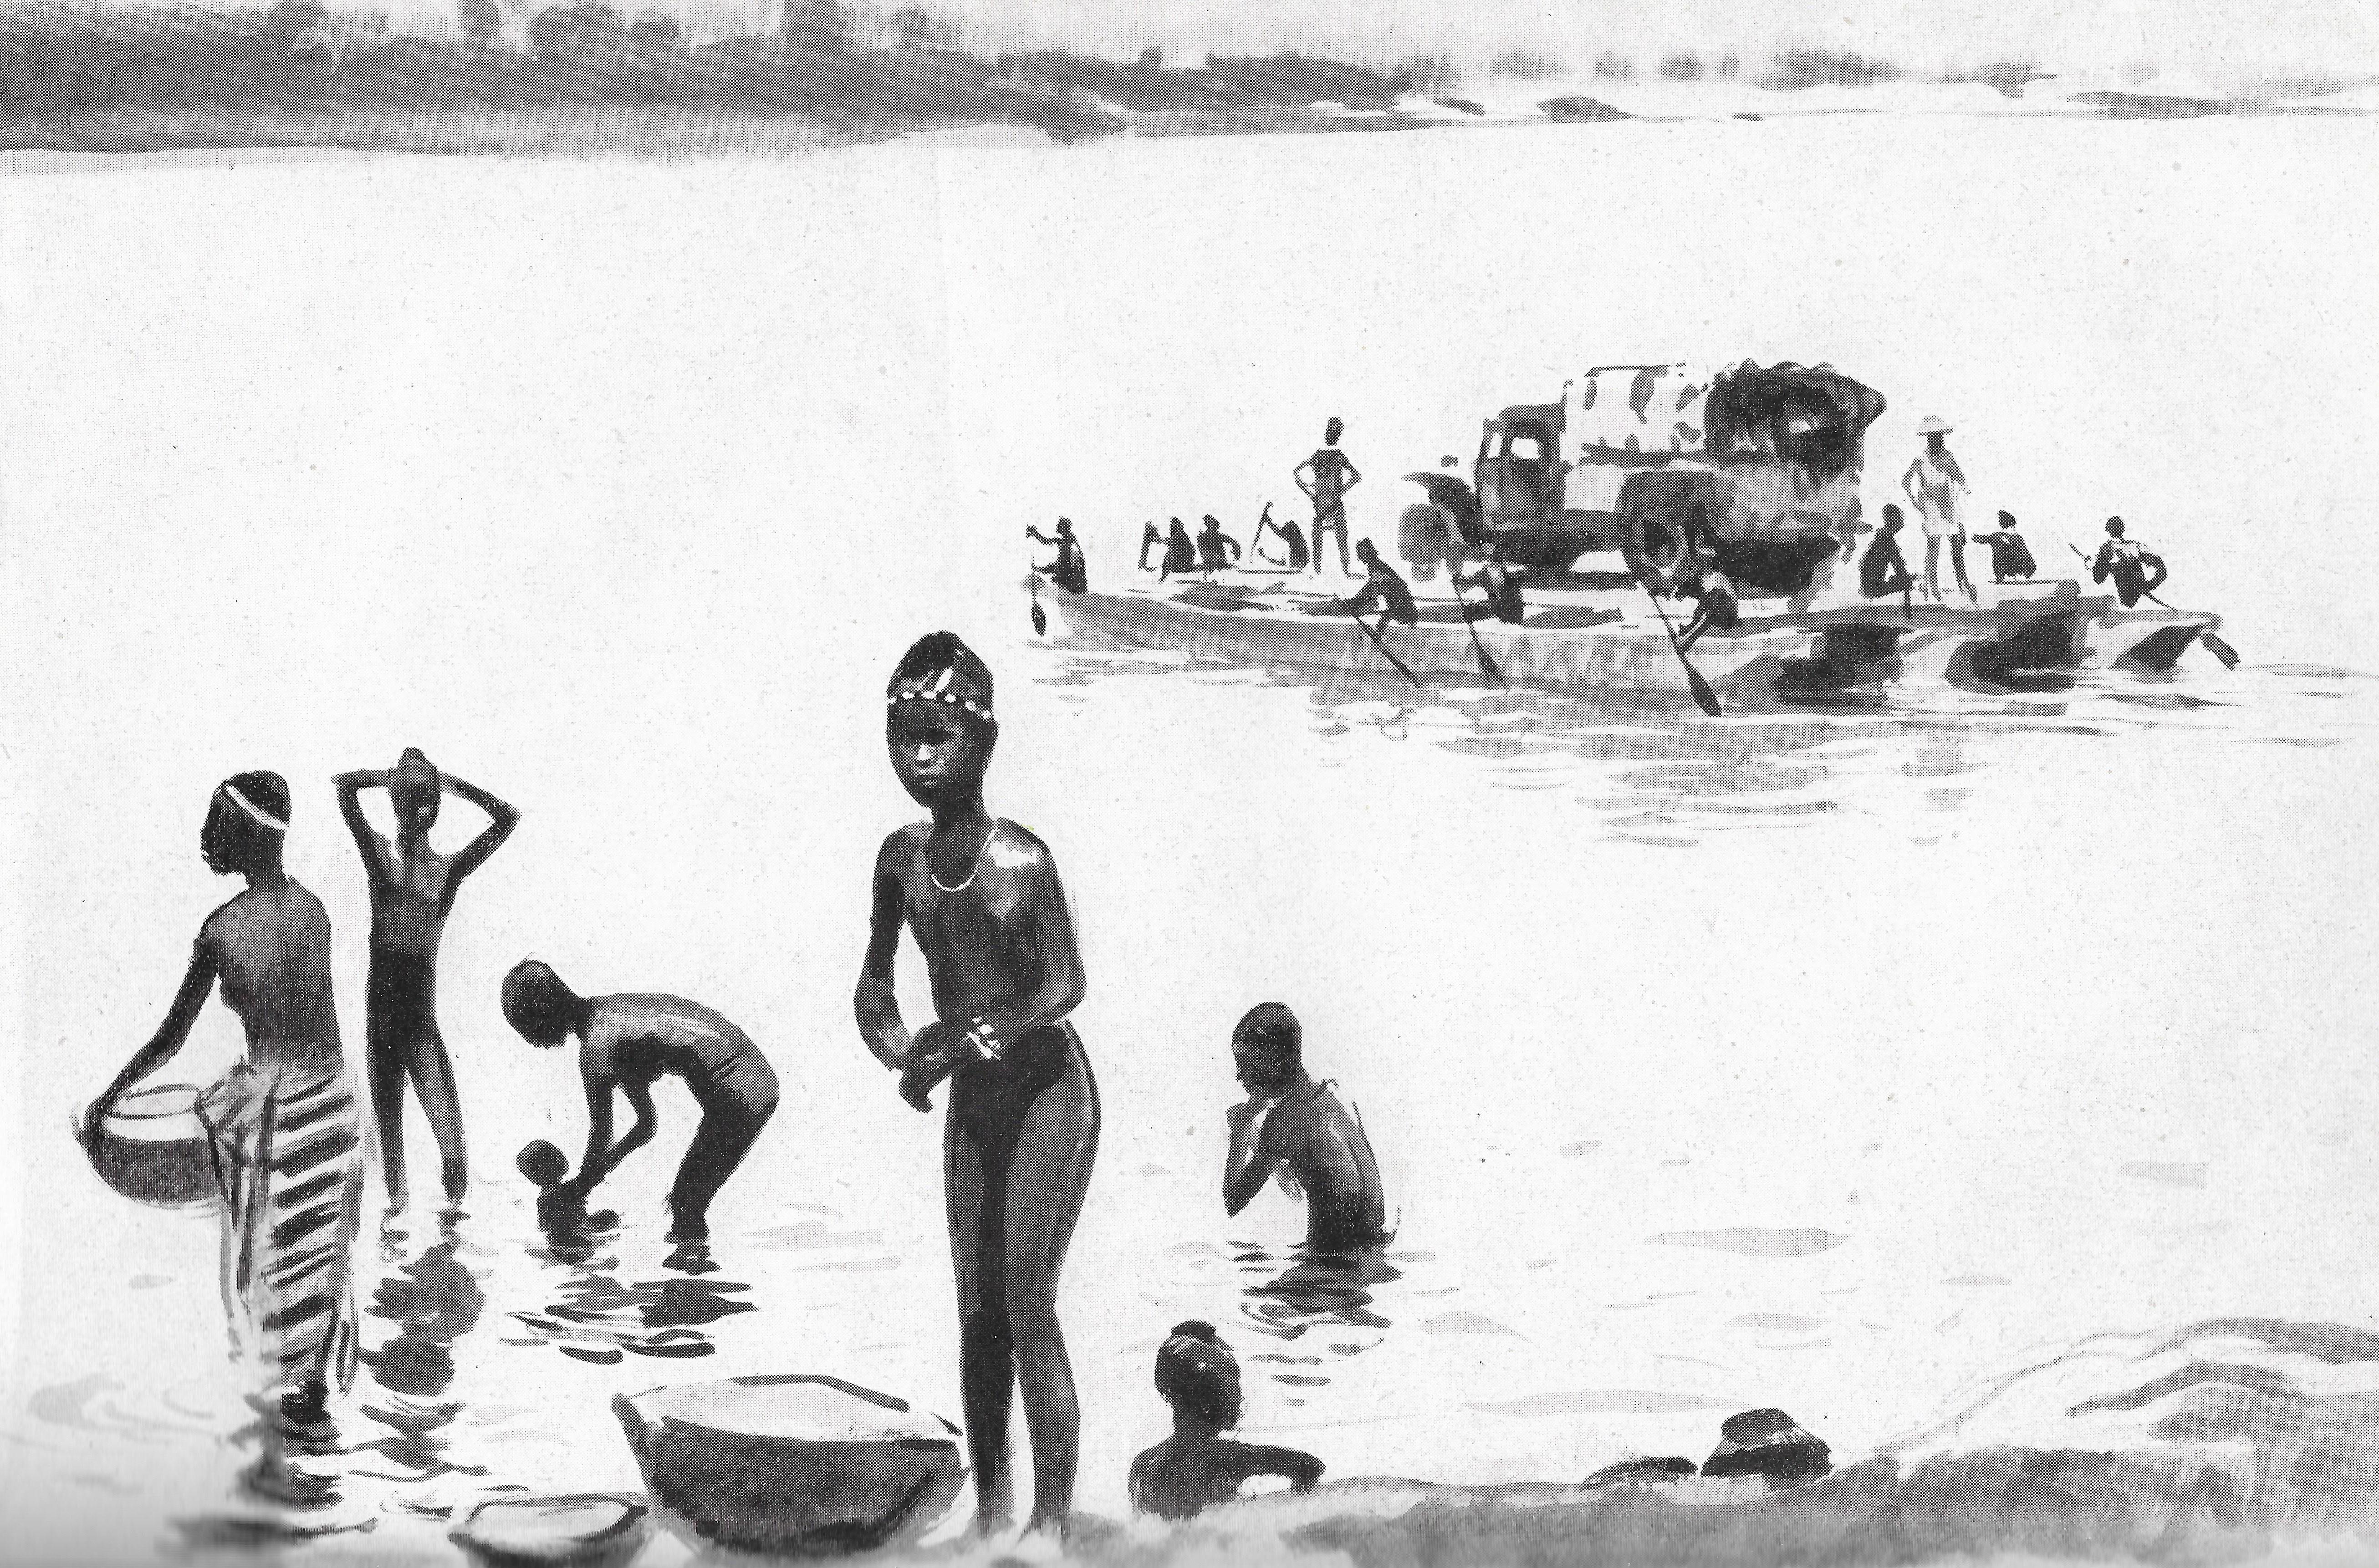 Albert Brenet bac en Afrique Colcombet